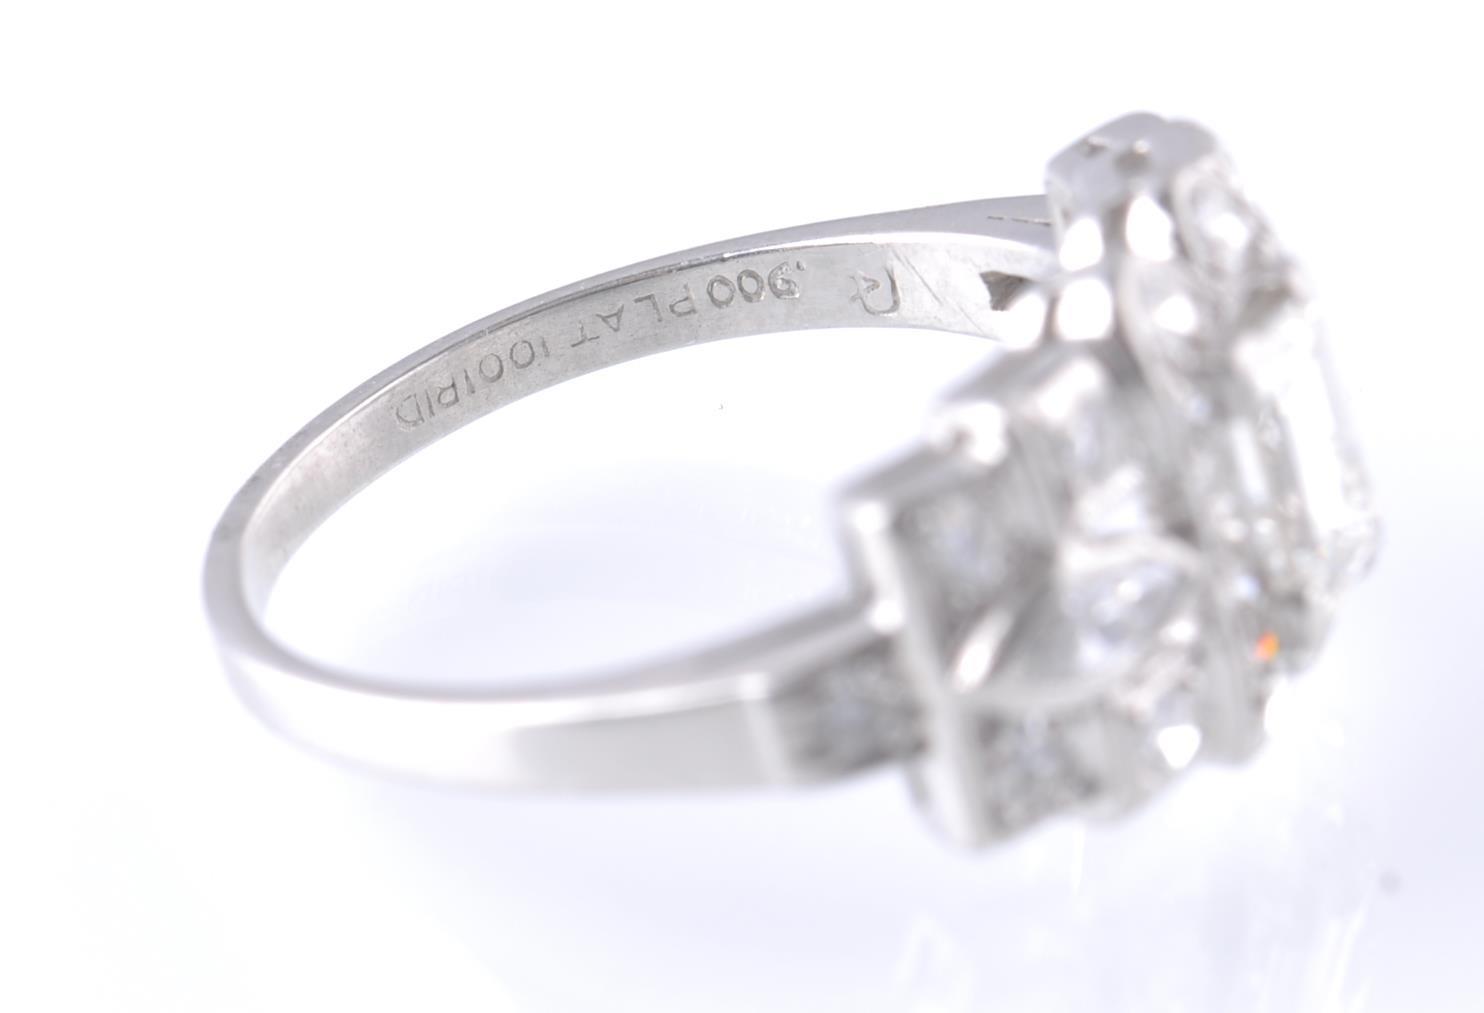 Lot 44 - ART DECO PLATINUM AND DIAMOND RING EMERALD AND MAR